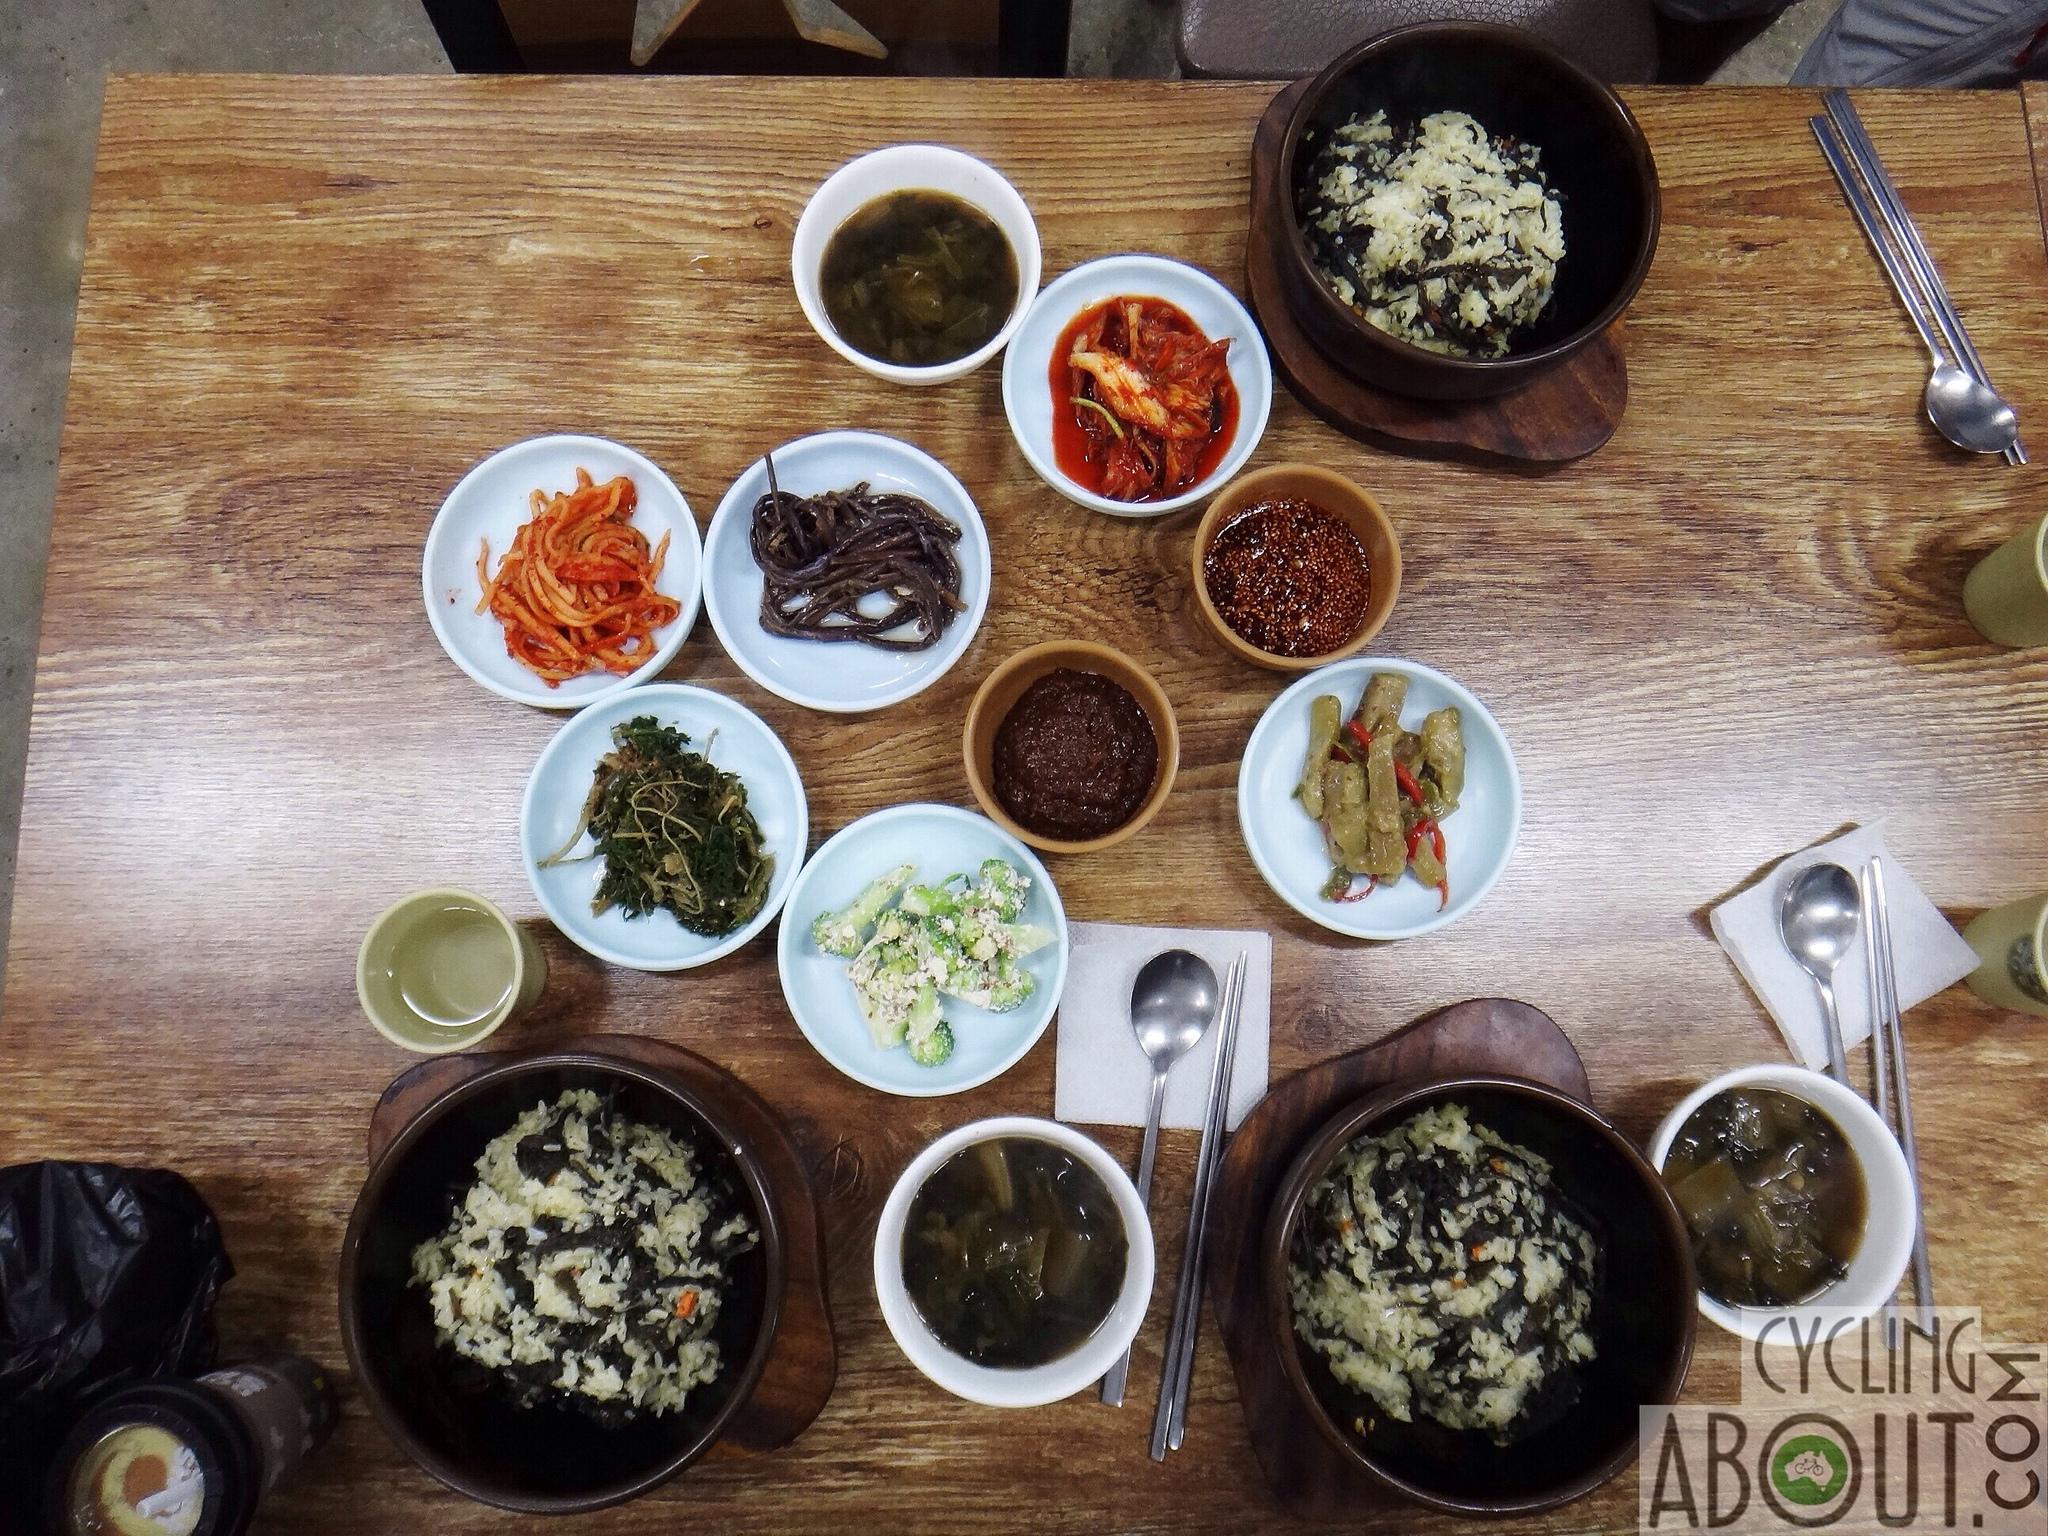 Alleykat_dinner in south korea